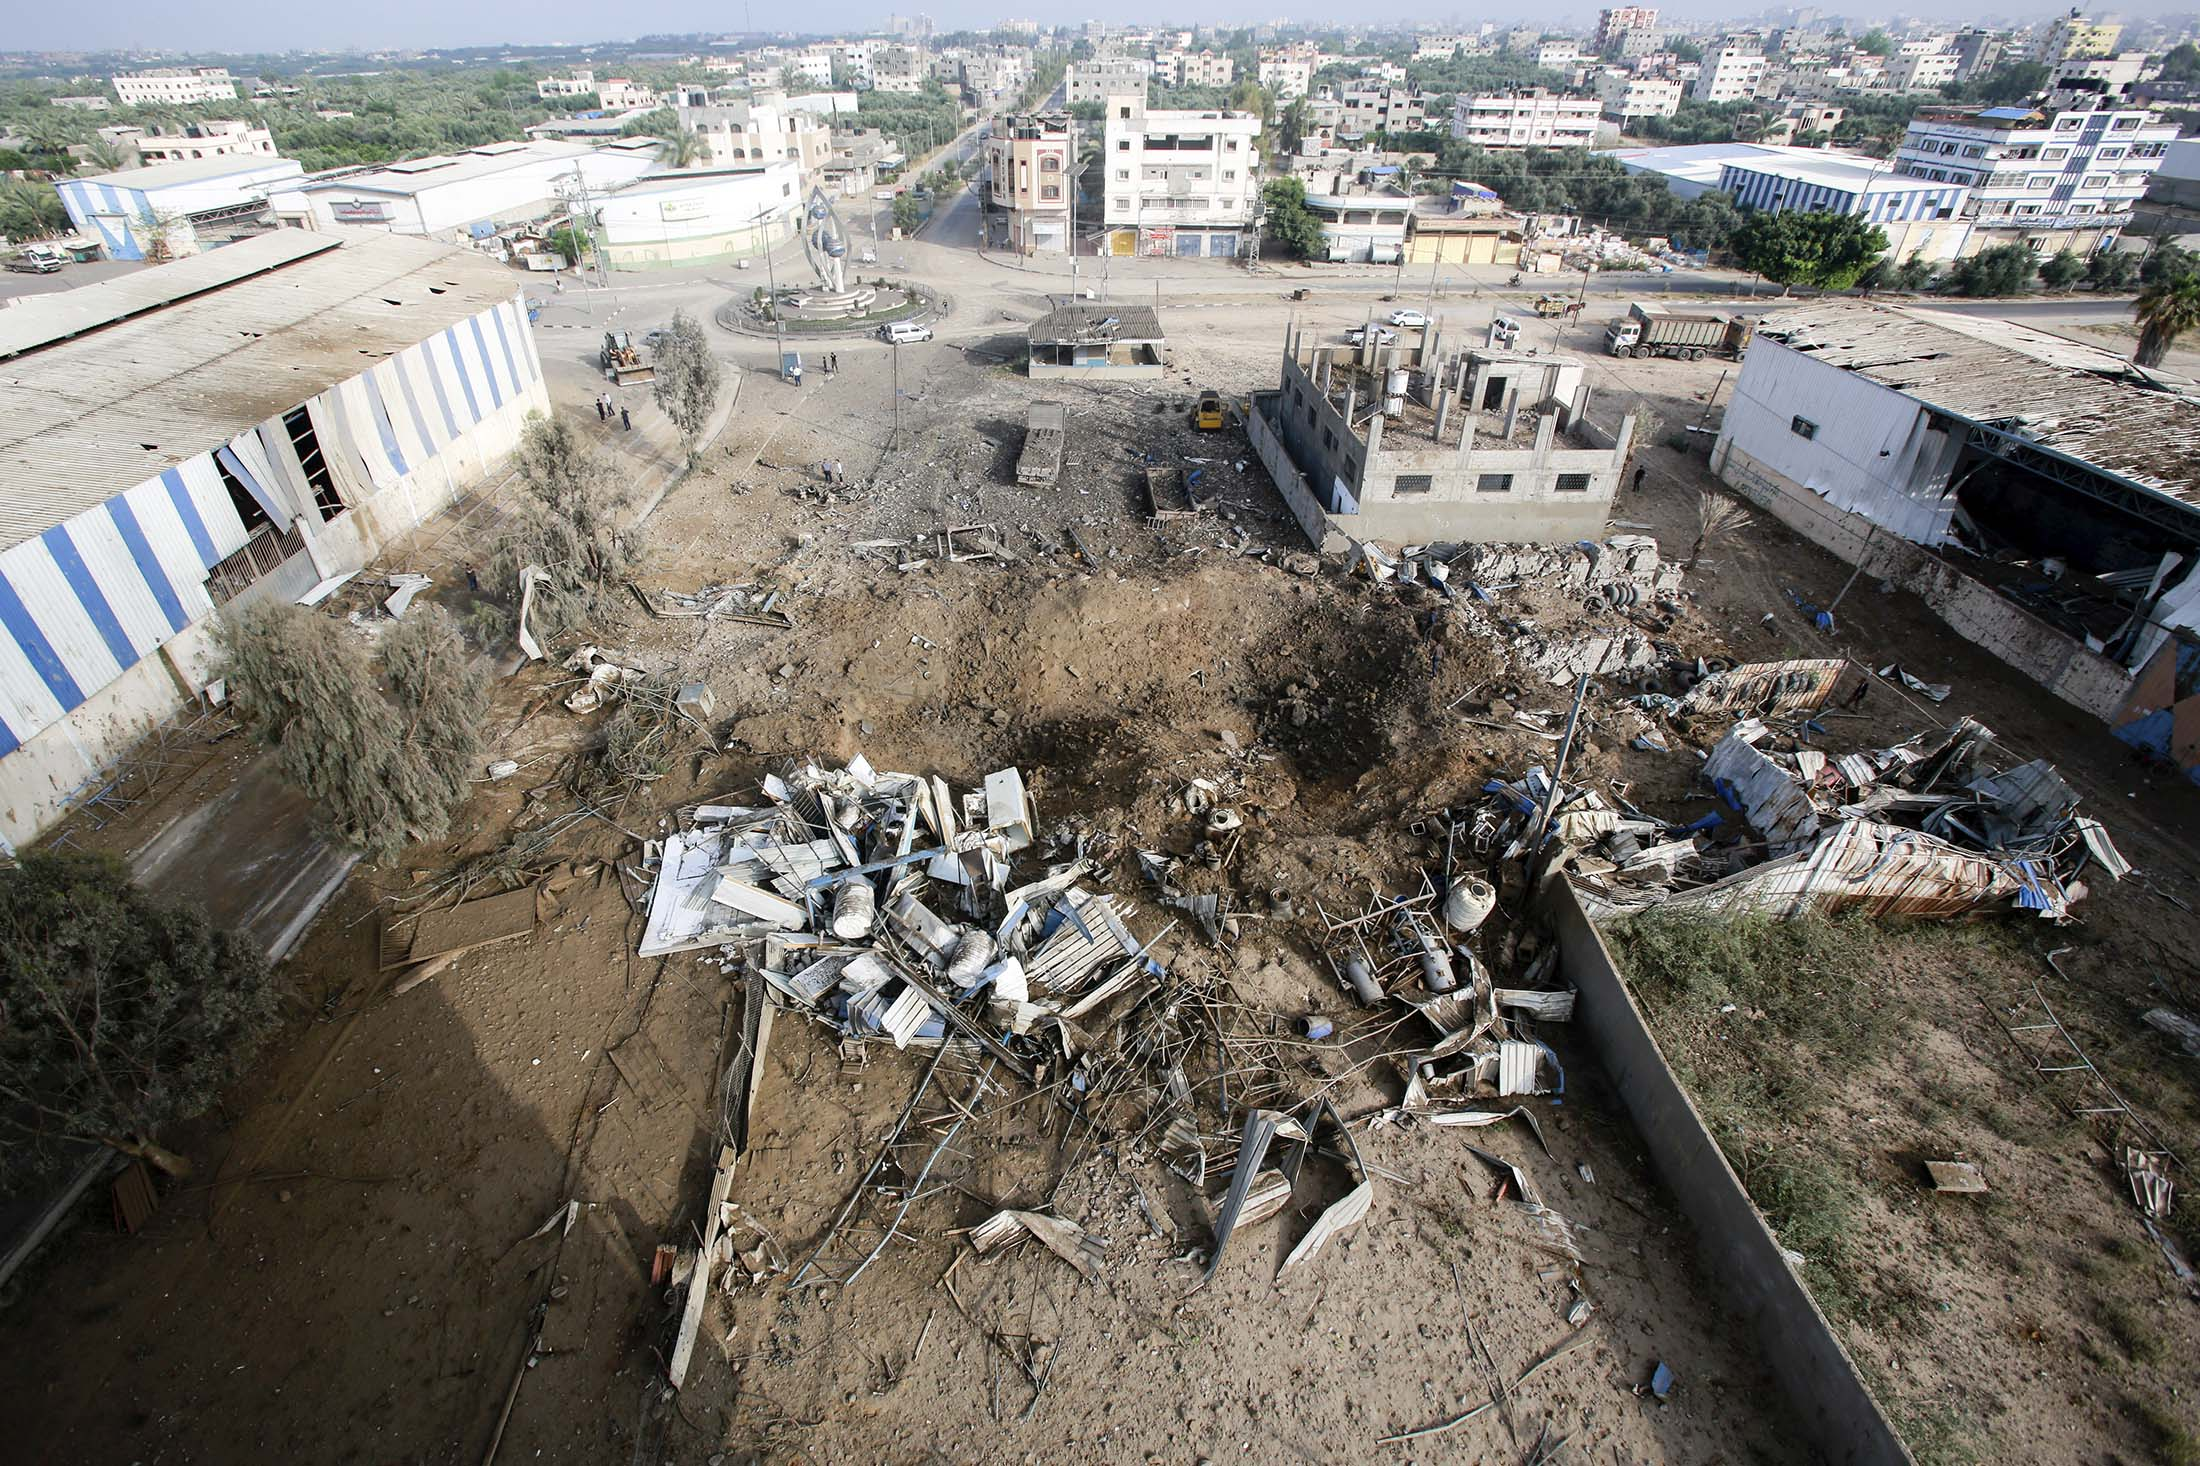 Debris seen at the site of an Israeli air strike.